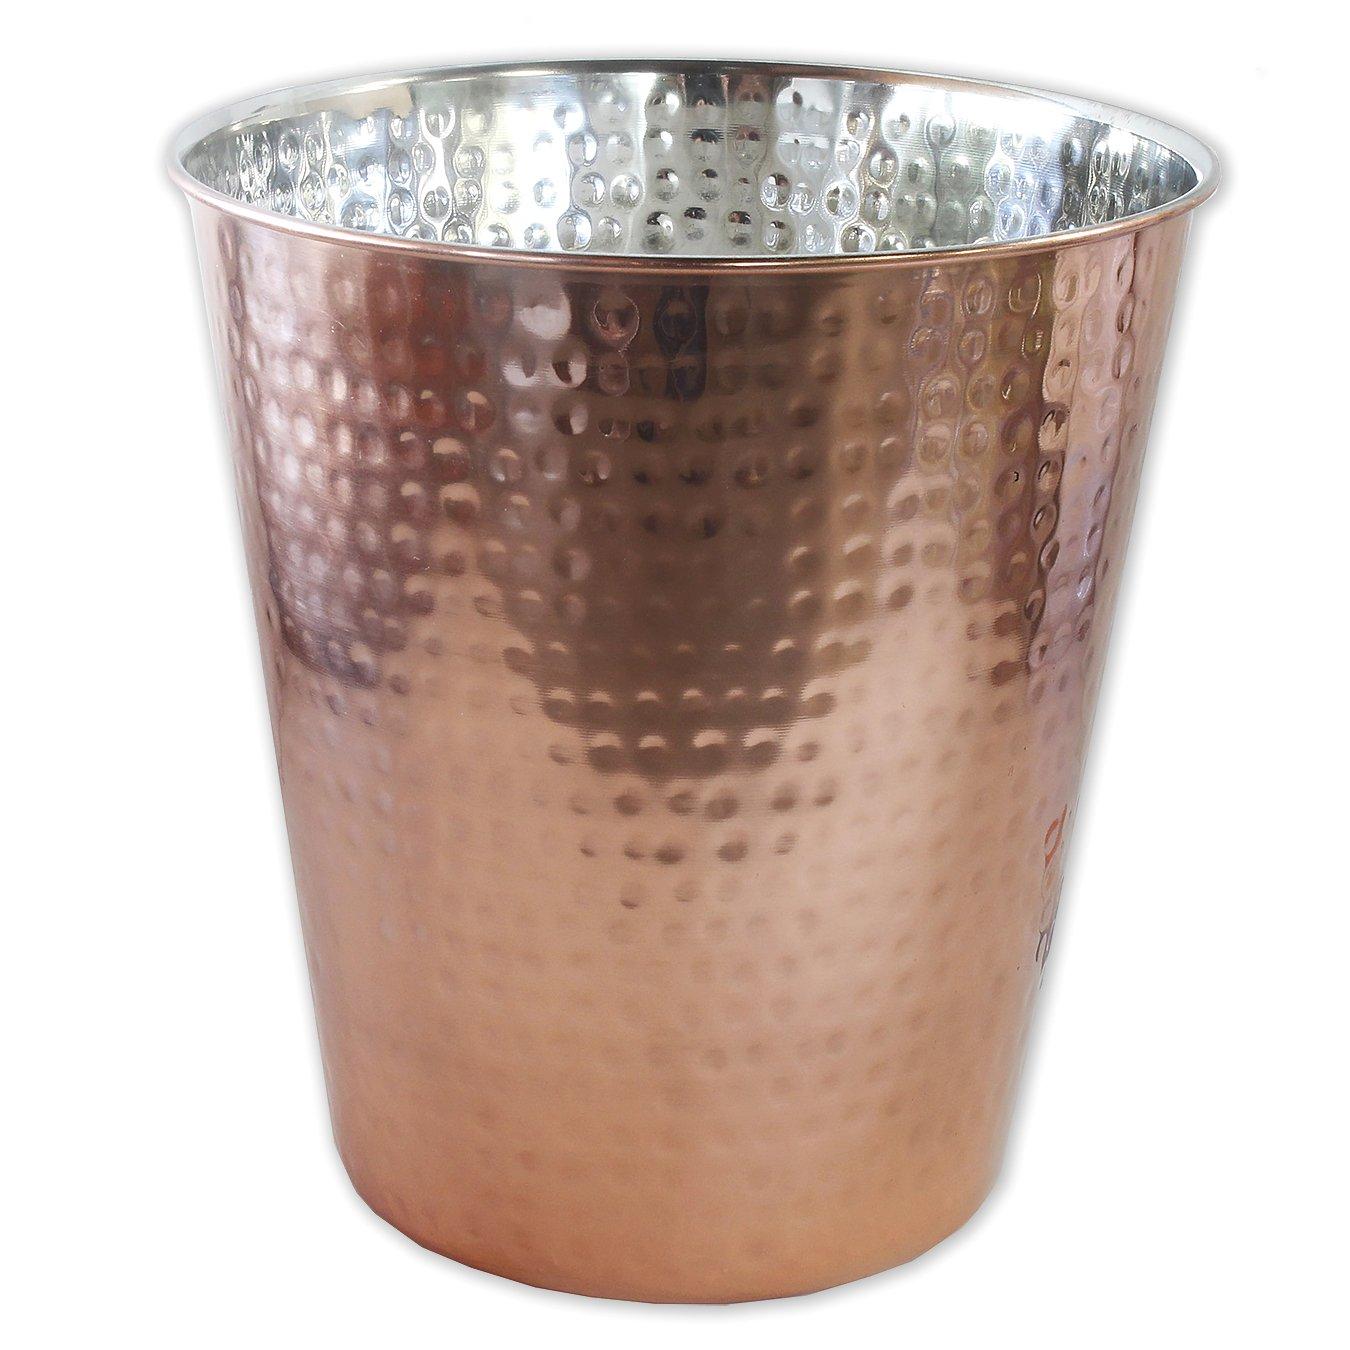 Waste Bin - Metal Wastebasket - Deskside Recycling Trash Can, Garbage Bin, Dustbin, Modern Home Décor, Perfect for Kitchen Bathroom Office Use - Hammered Copper Plated